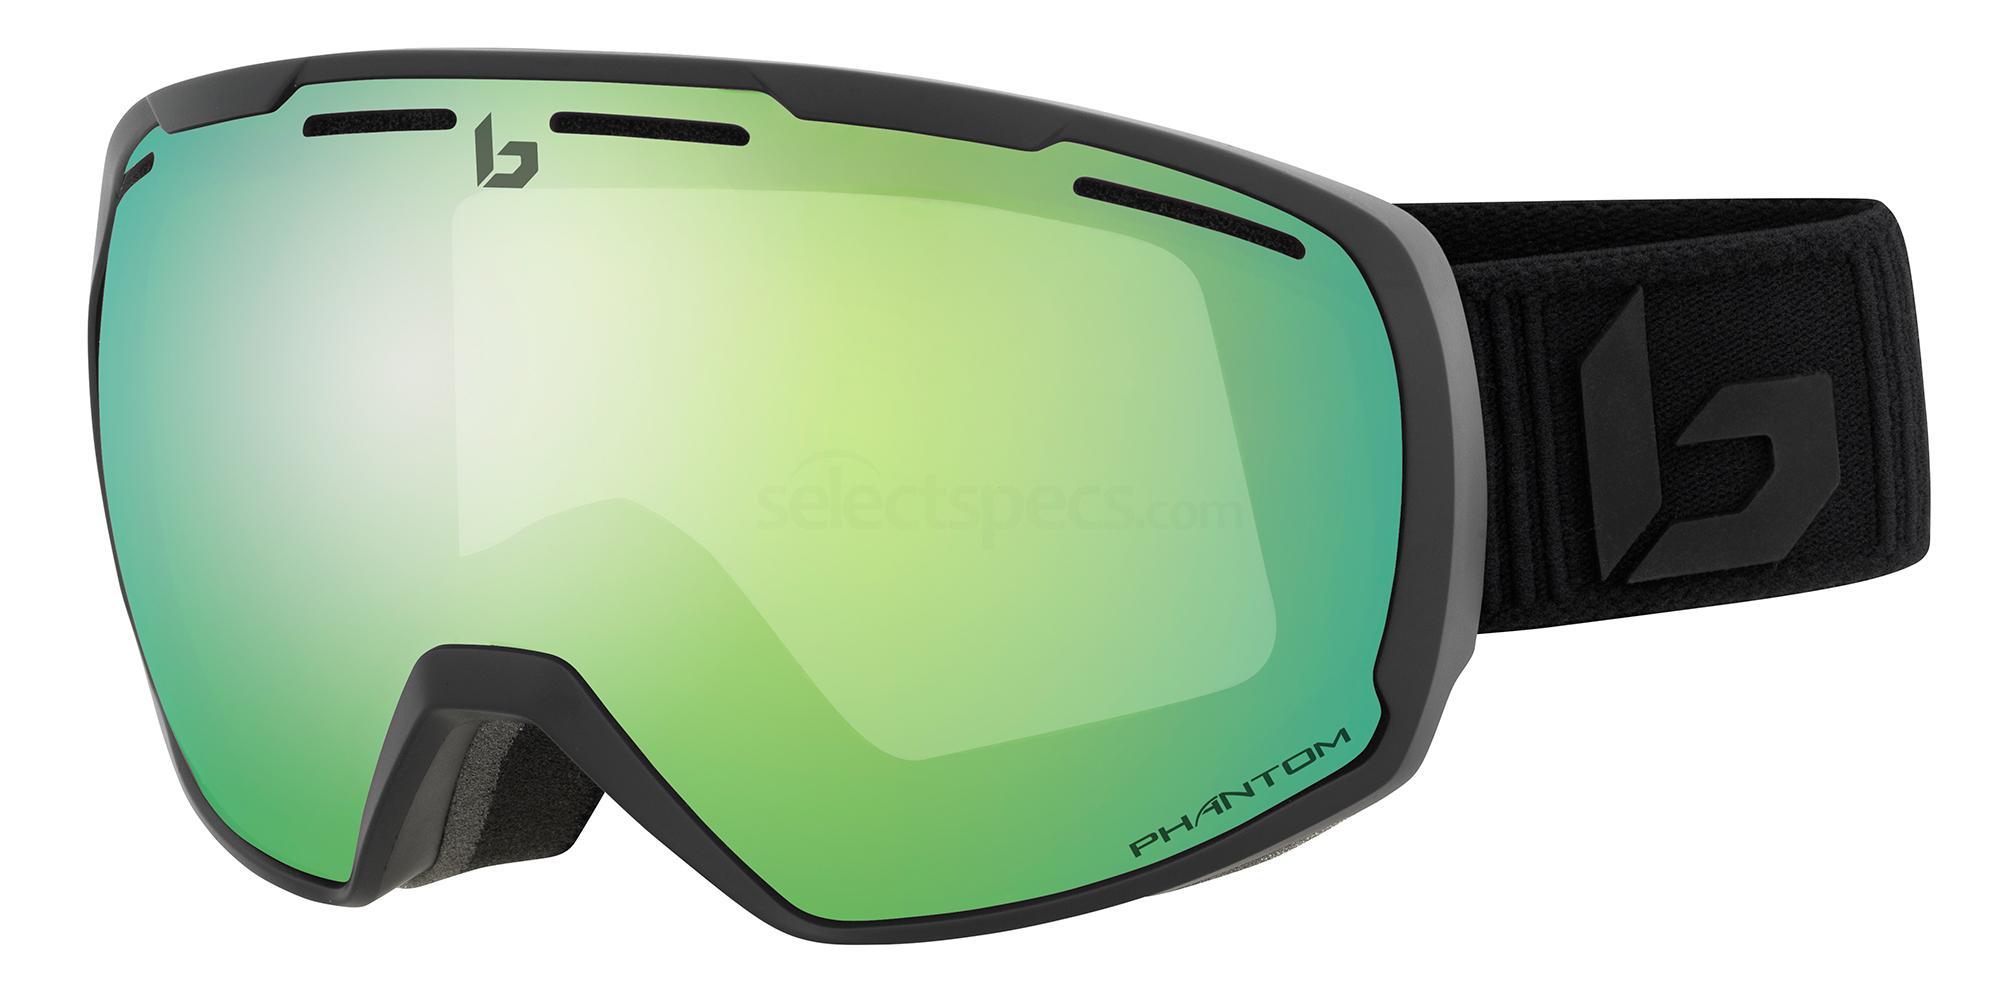 21979 LAIKA Goggles, Bolle